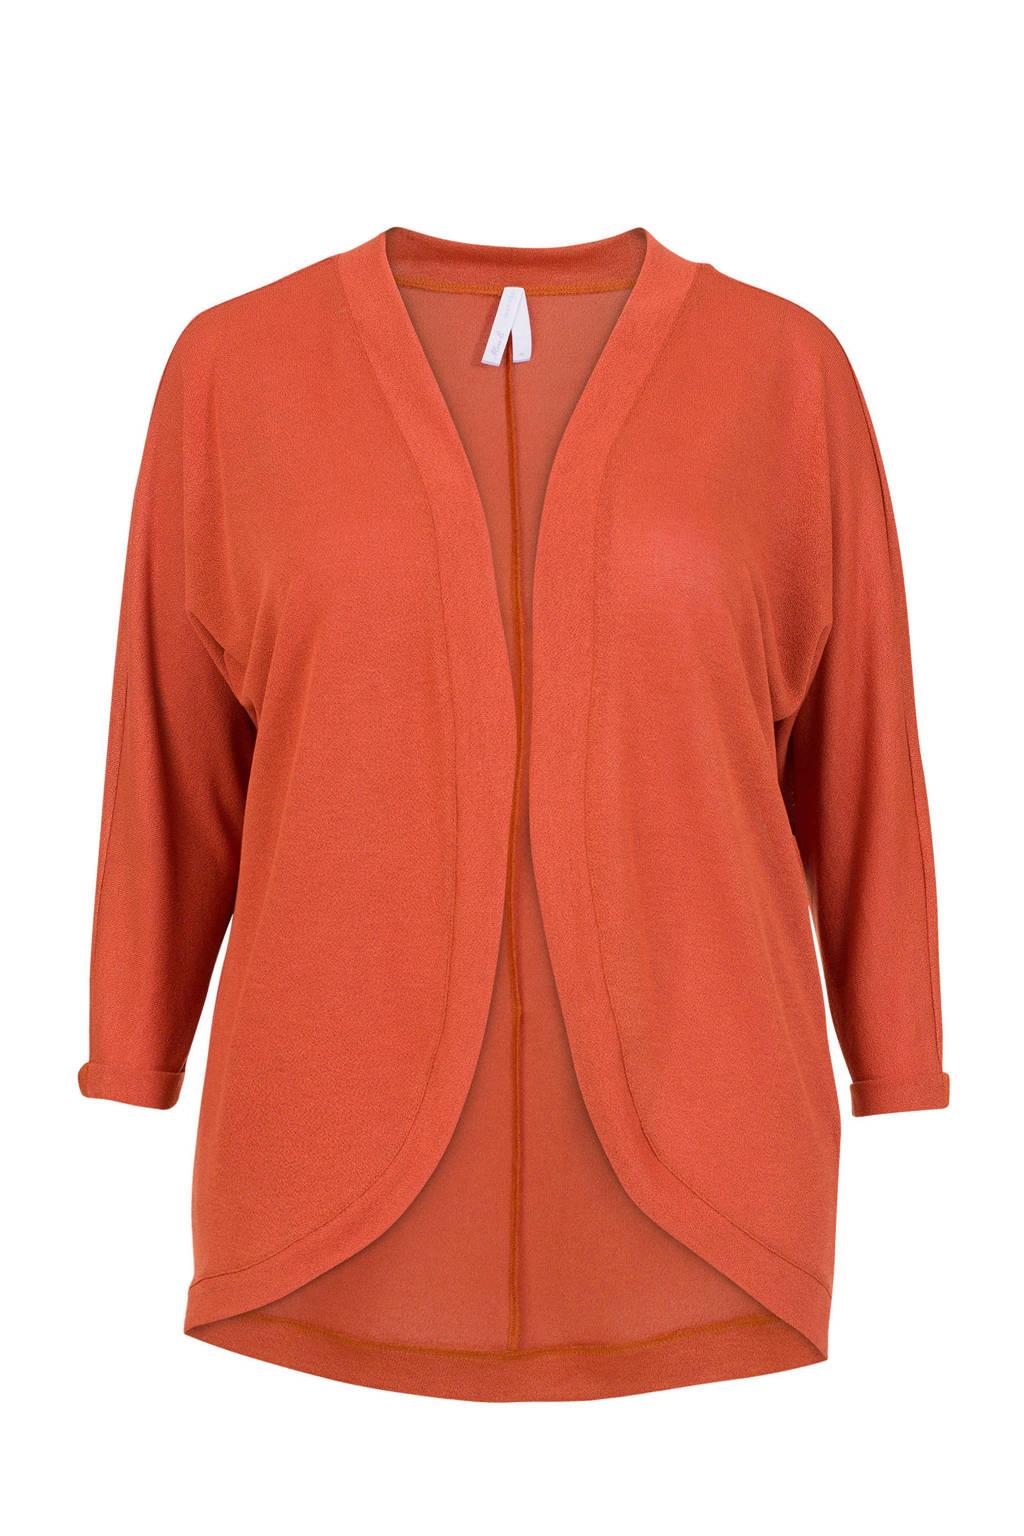 Miss Etam Plus vest oranje, Oranje